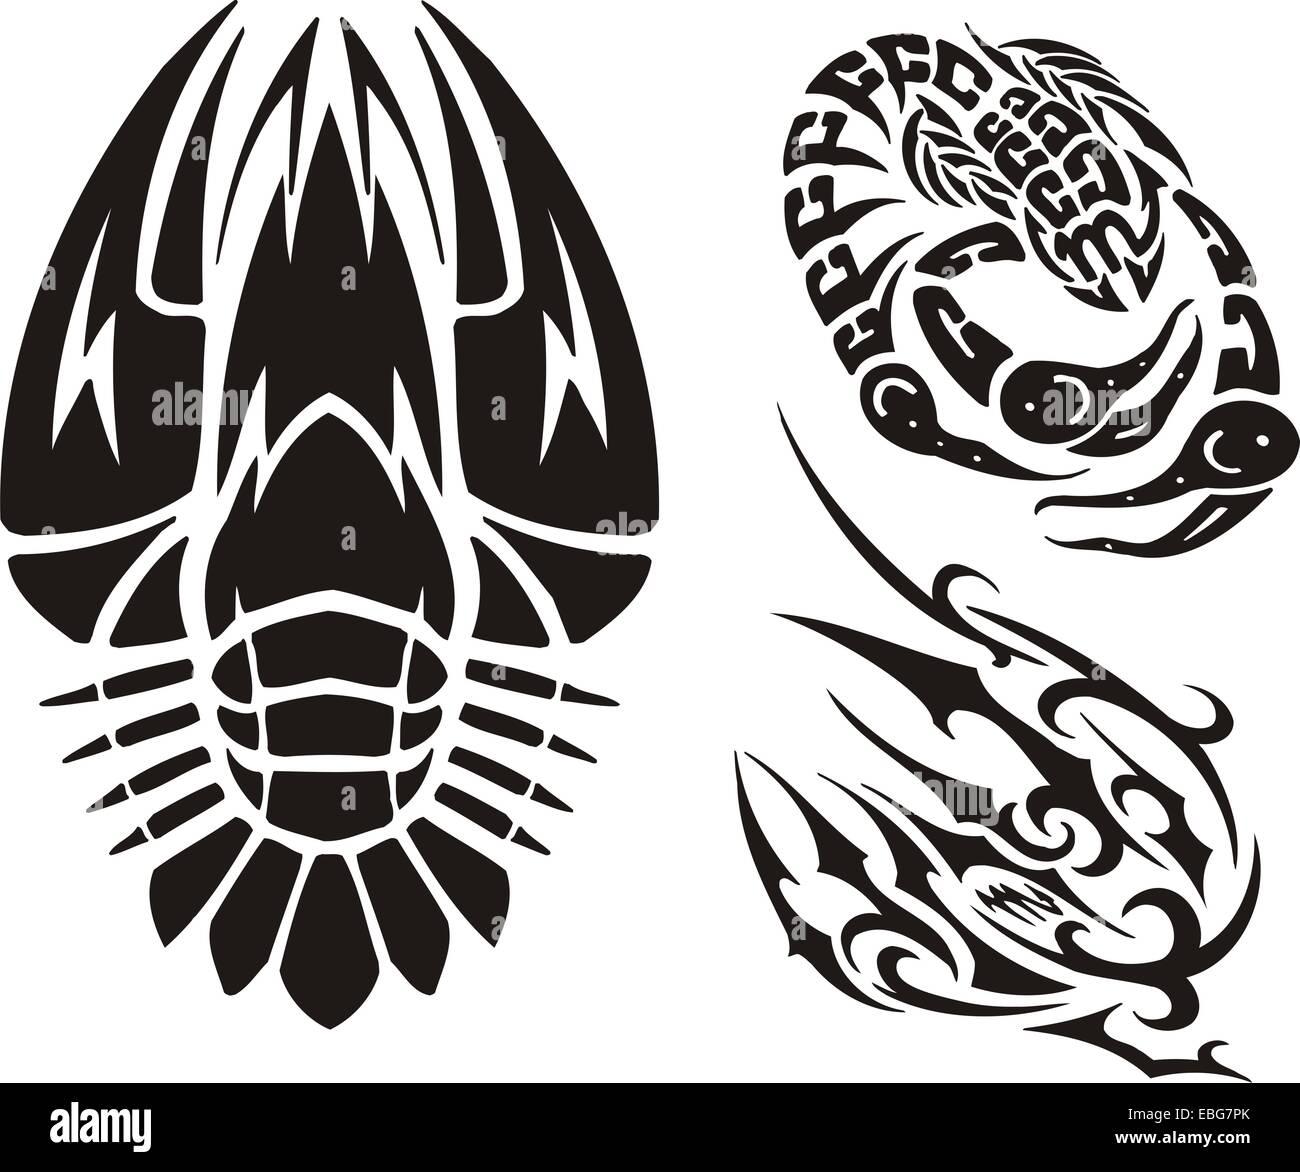 Zodiac Signs - cancer. Vinyl-ready vector set. - Stock Image